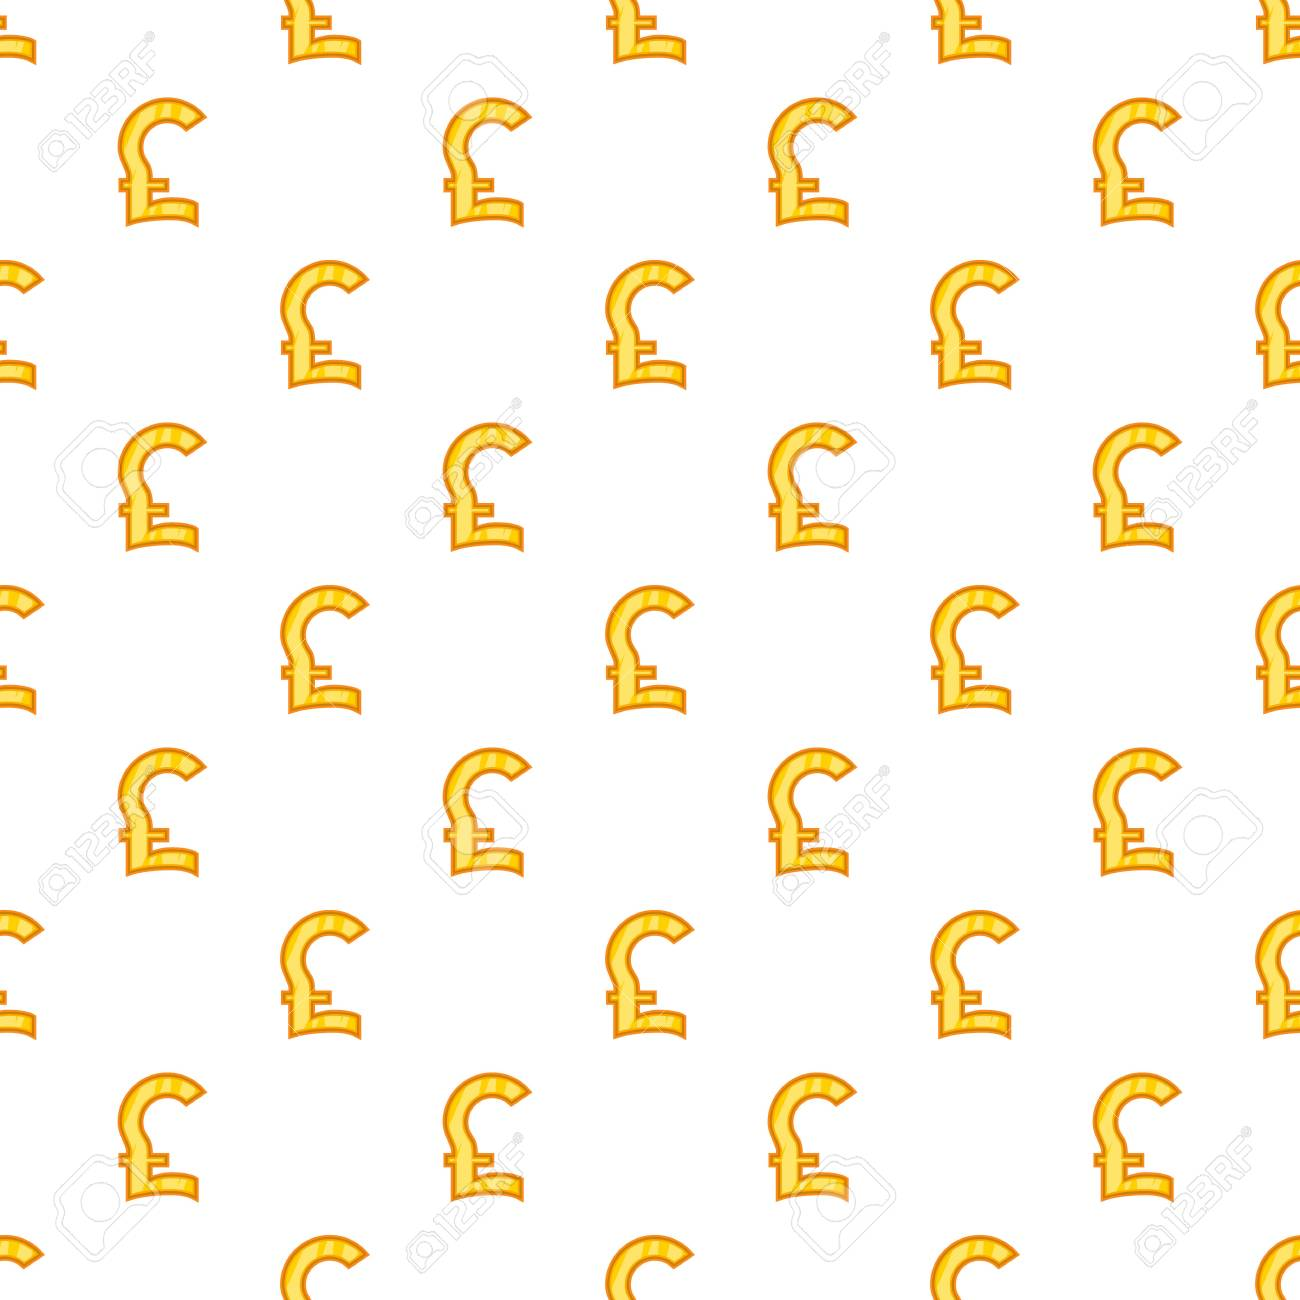 Pound currency symbol pattern cartoon illustration of pound pound currency symbol pattern cartoon illustration of pound currency symbol vector pattern for web stock buycottarizona Choice Image